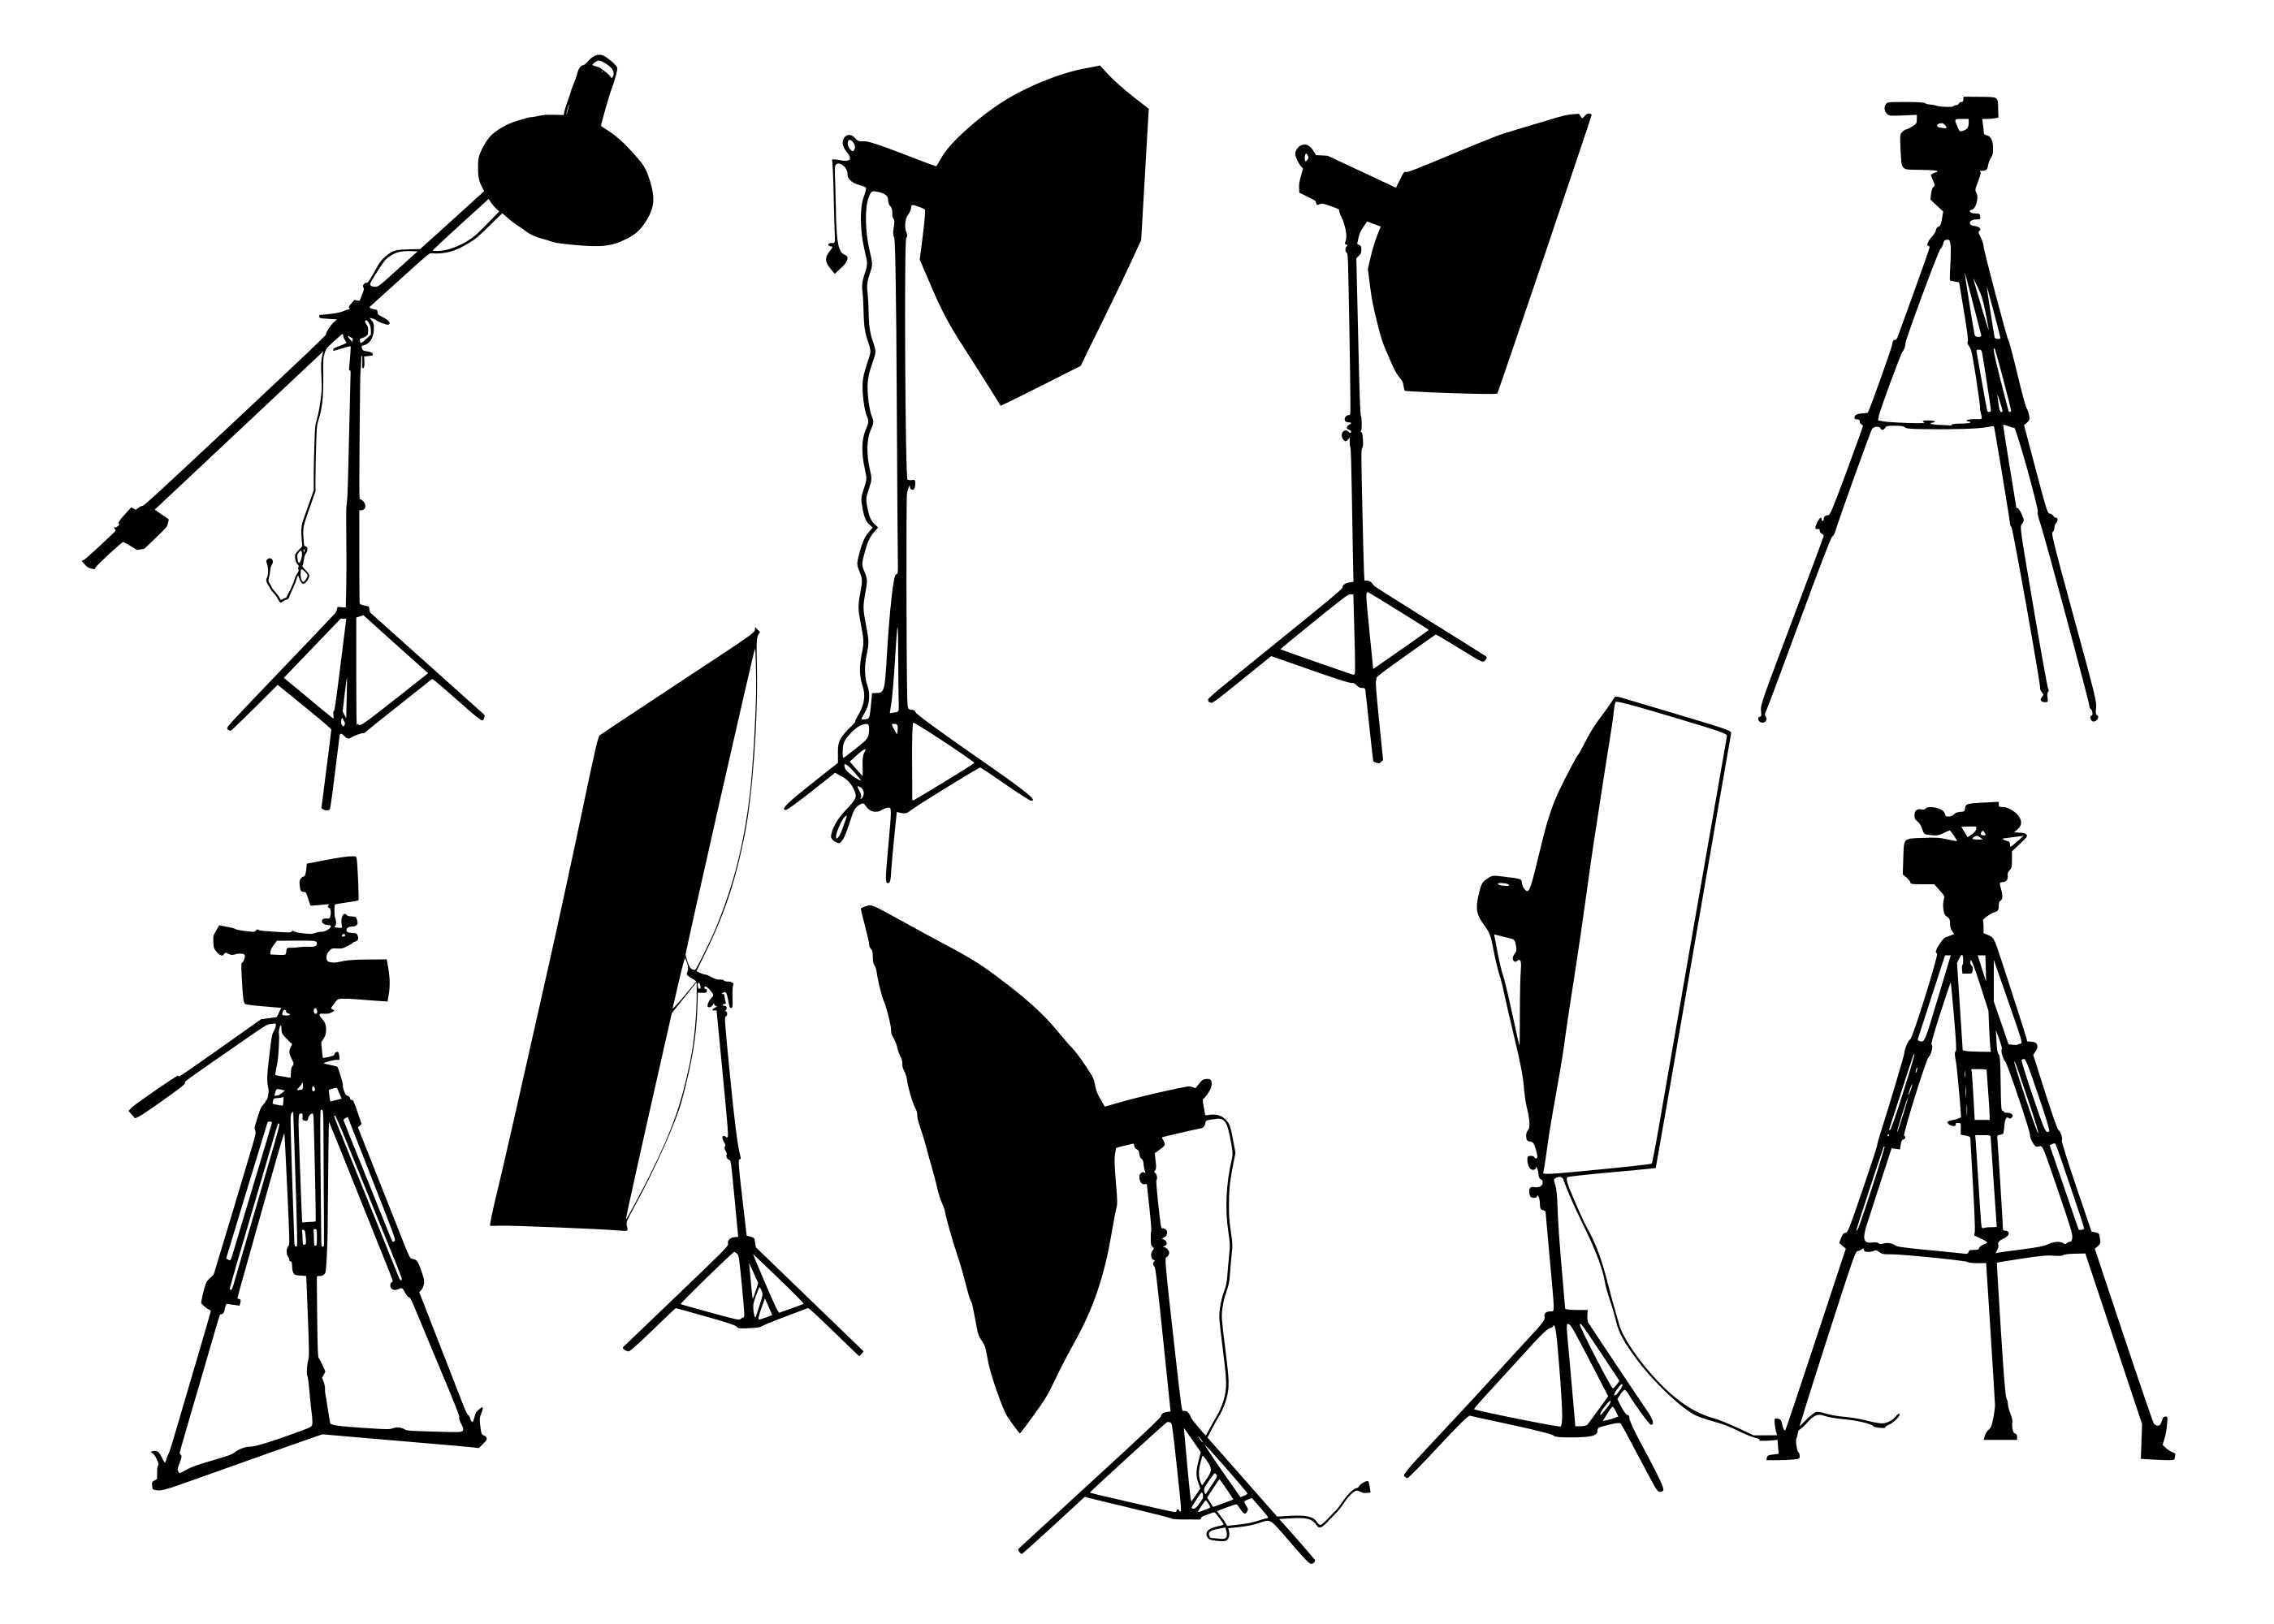 9-photo-studio-equipment-silhouette-cover.jpg